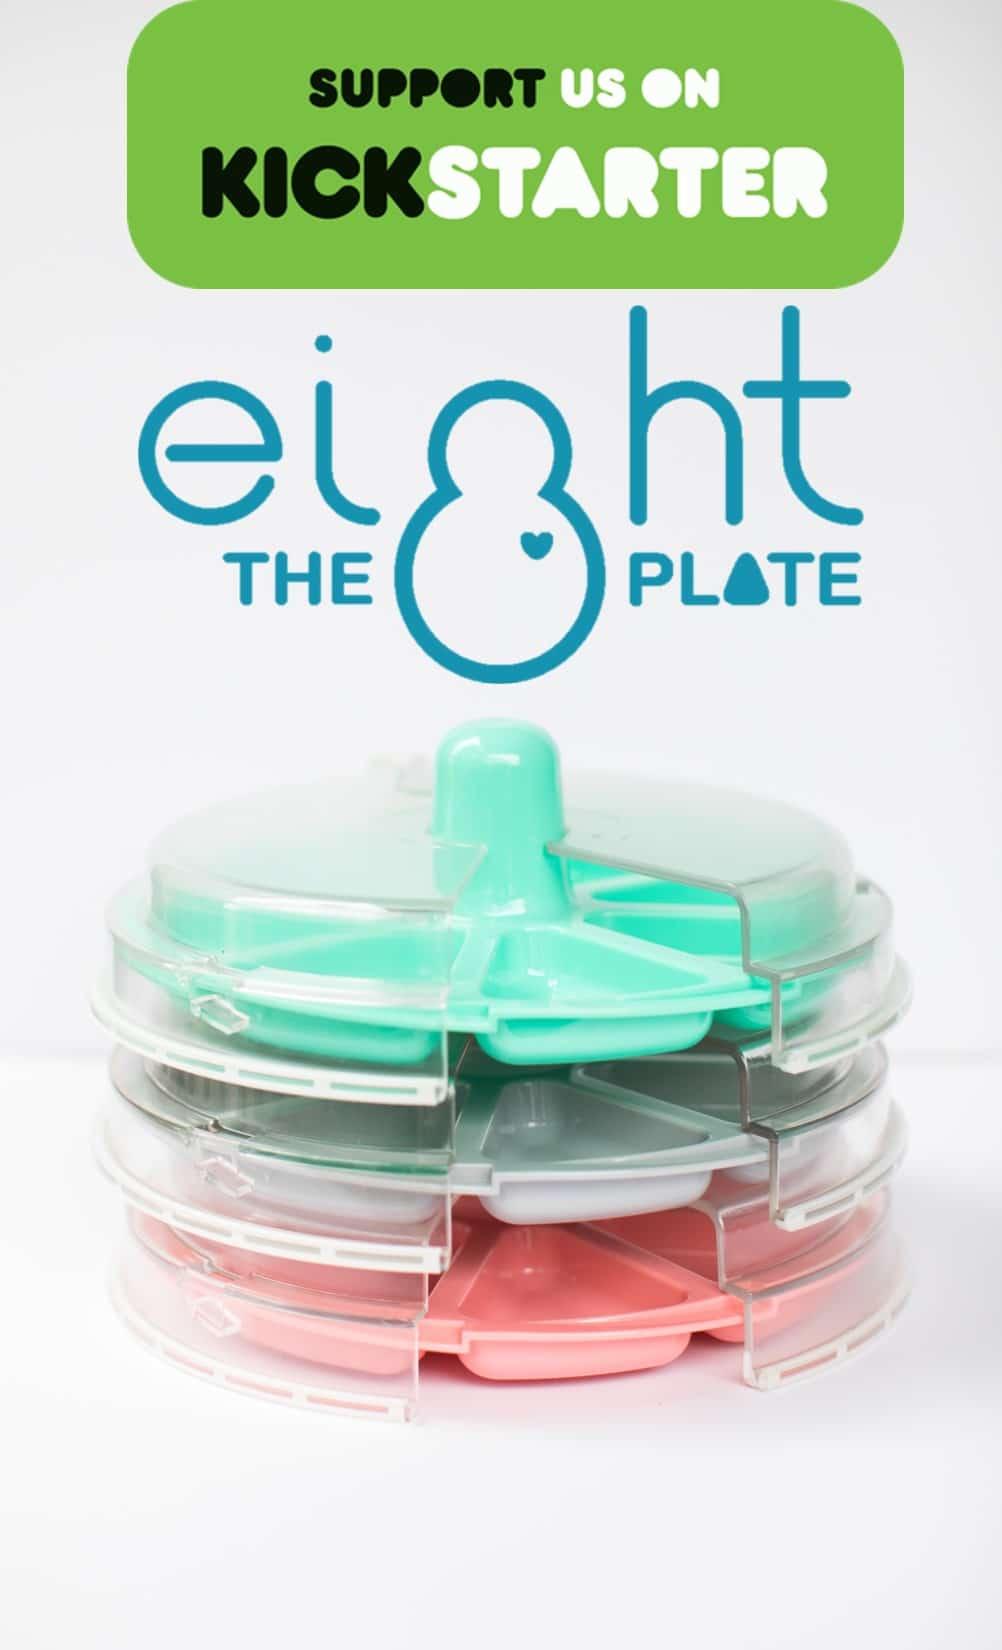 8 The Plate On Kickstarter